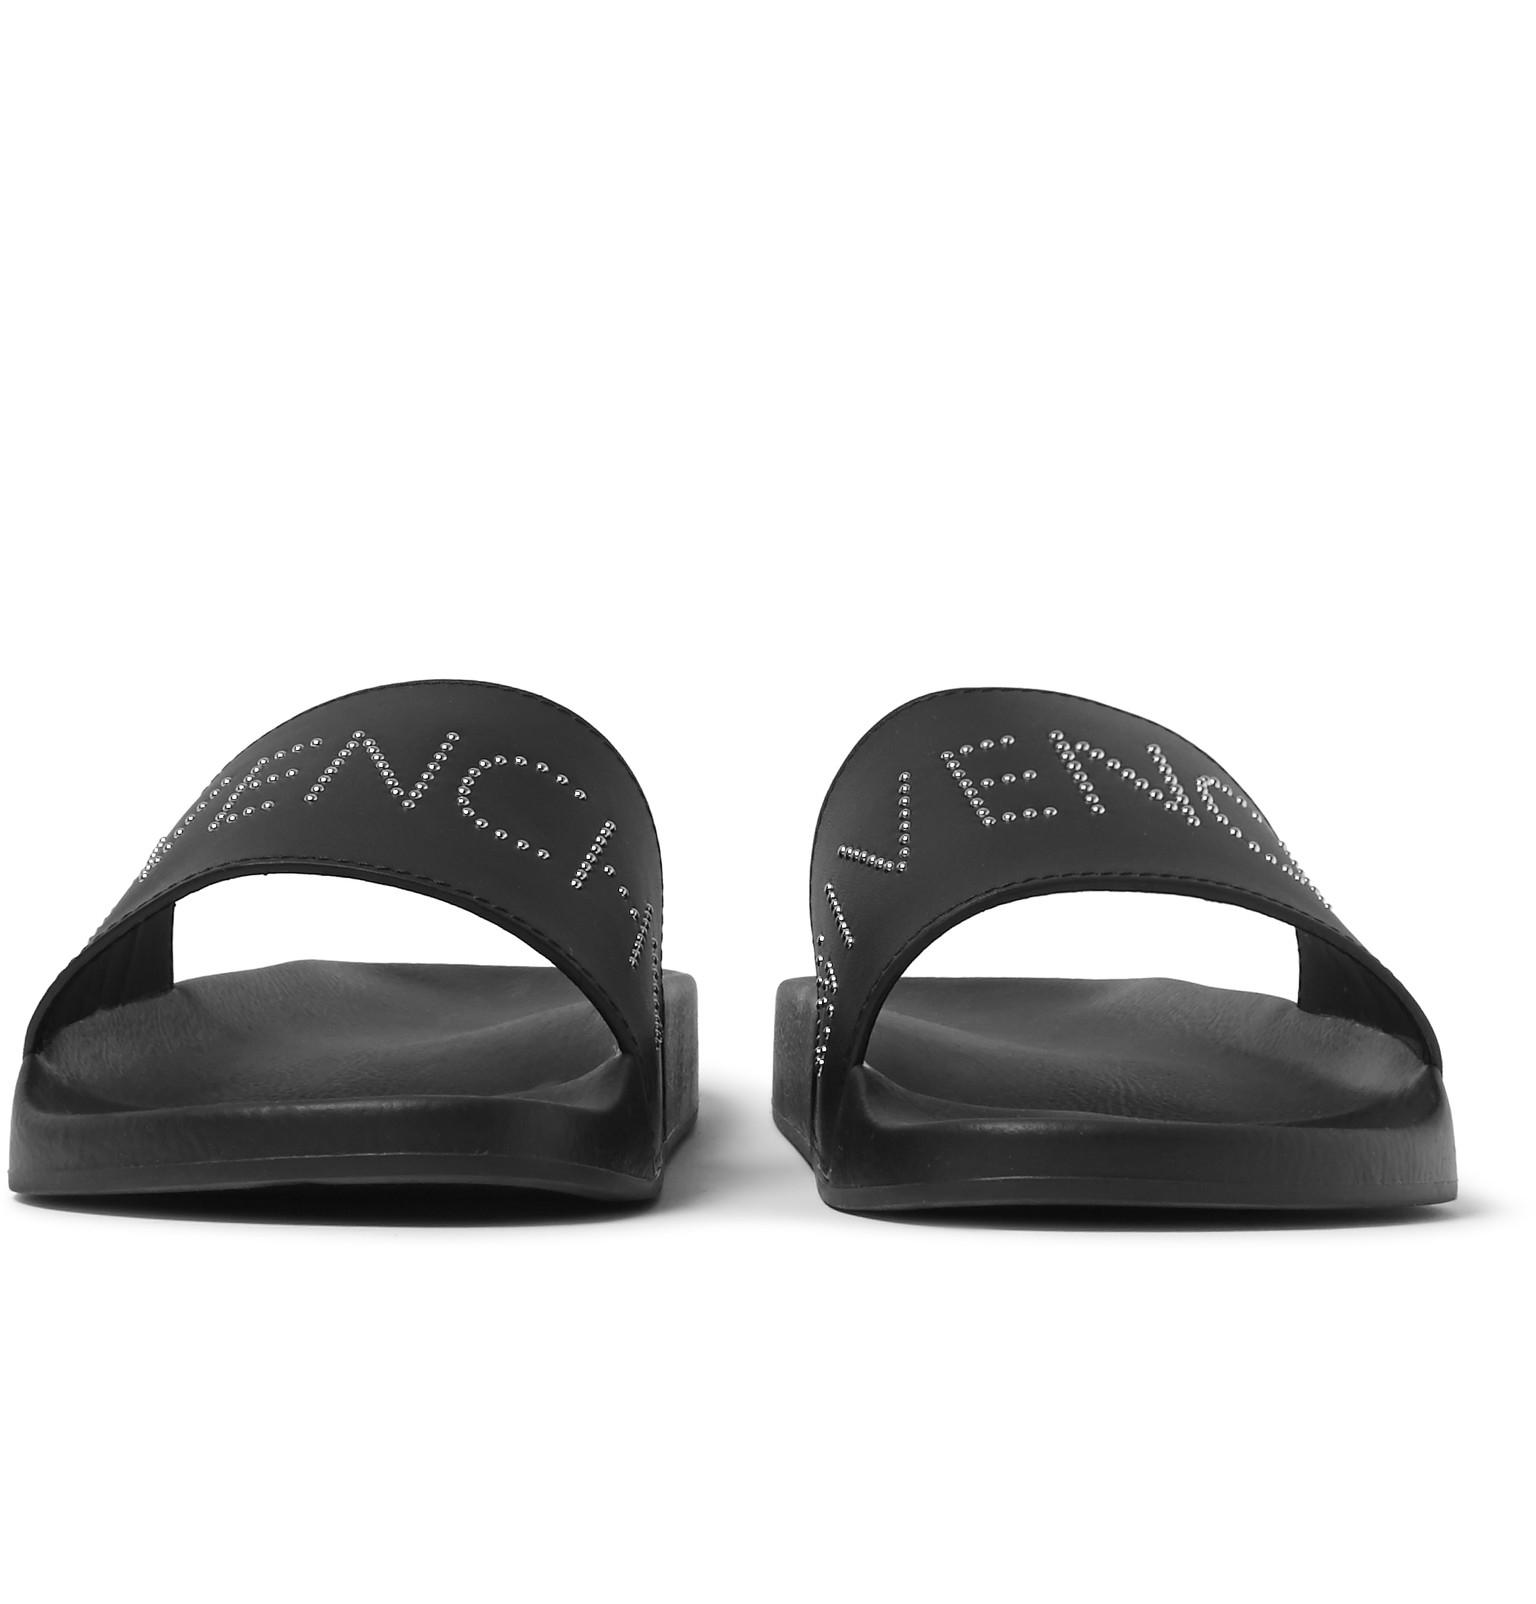 ddfef435eb2b Givenchy Studded Leather Slides in Black for Men - Lyst